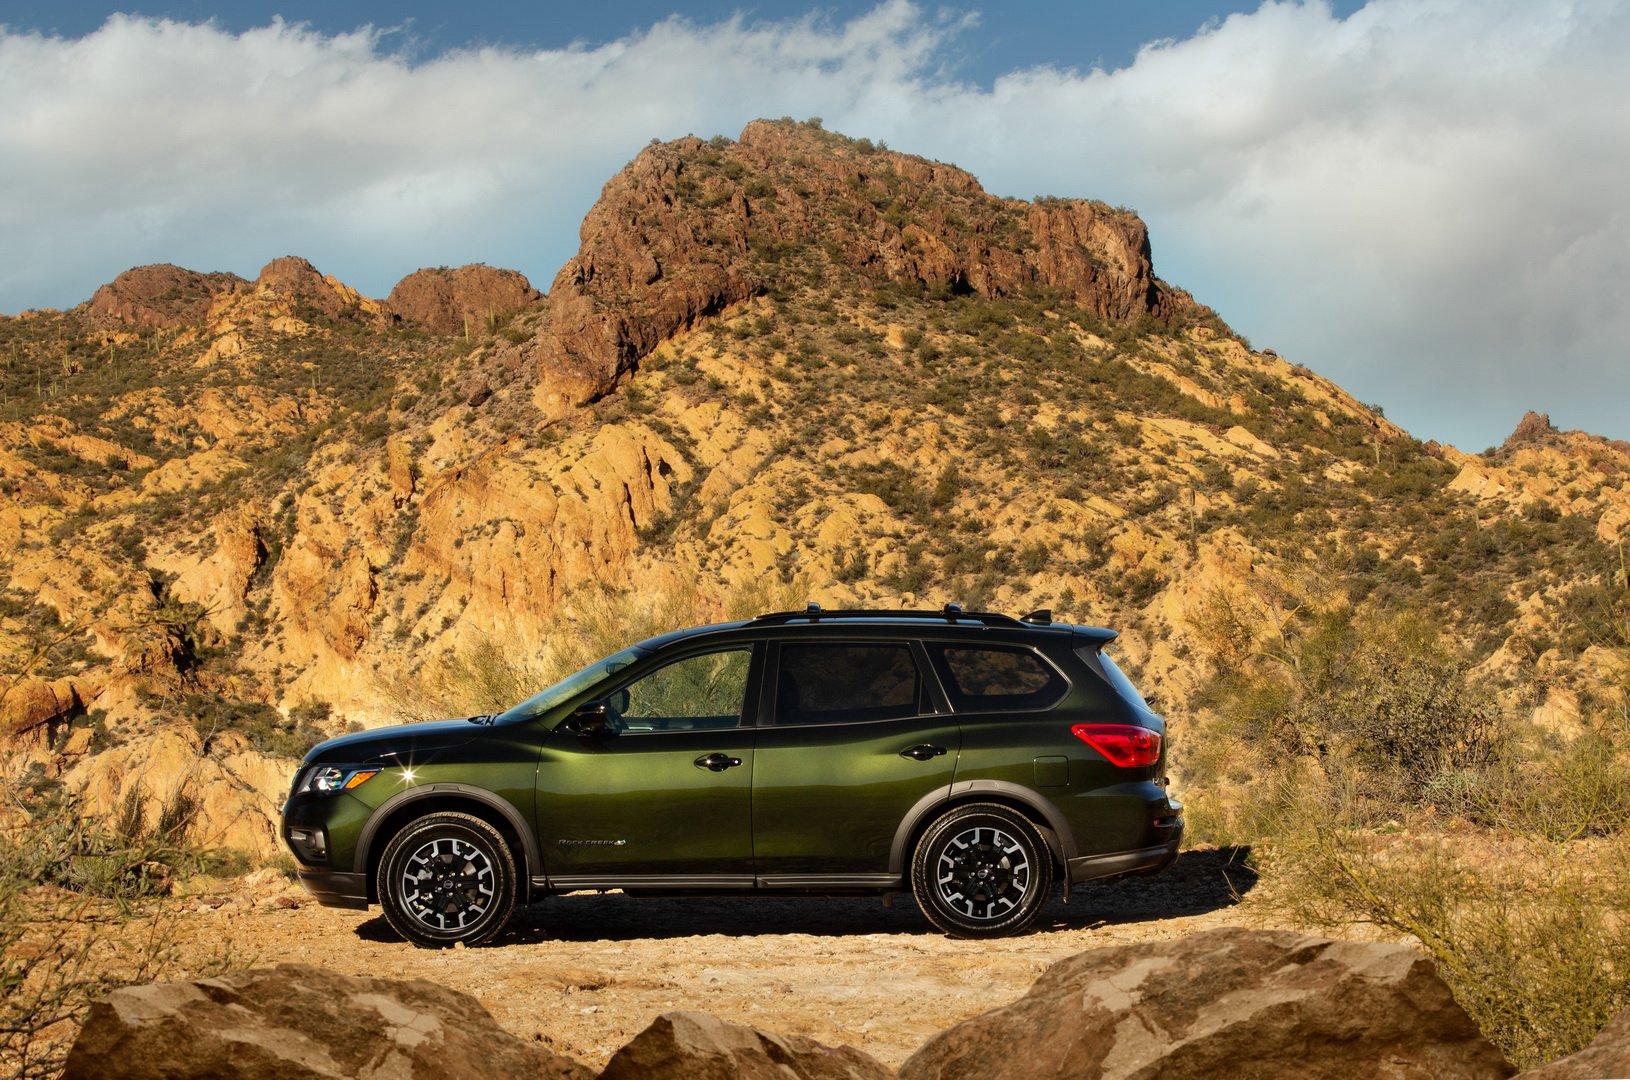 Nissan Pathfinder Rock Creek Edition 2019 (2)